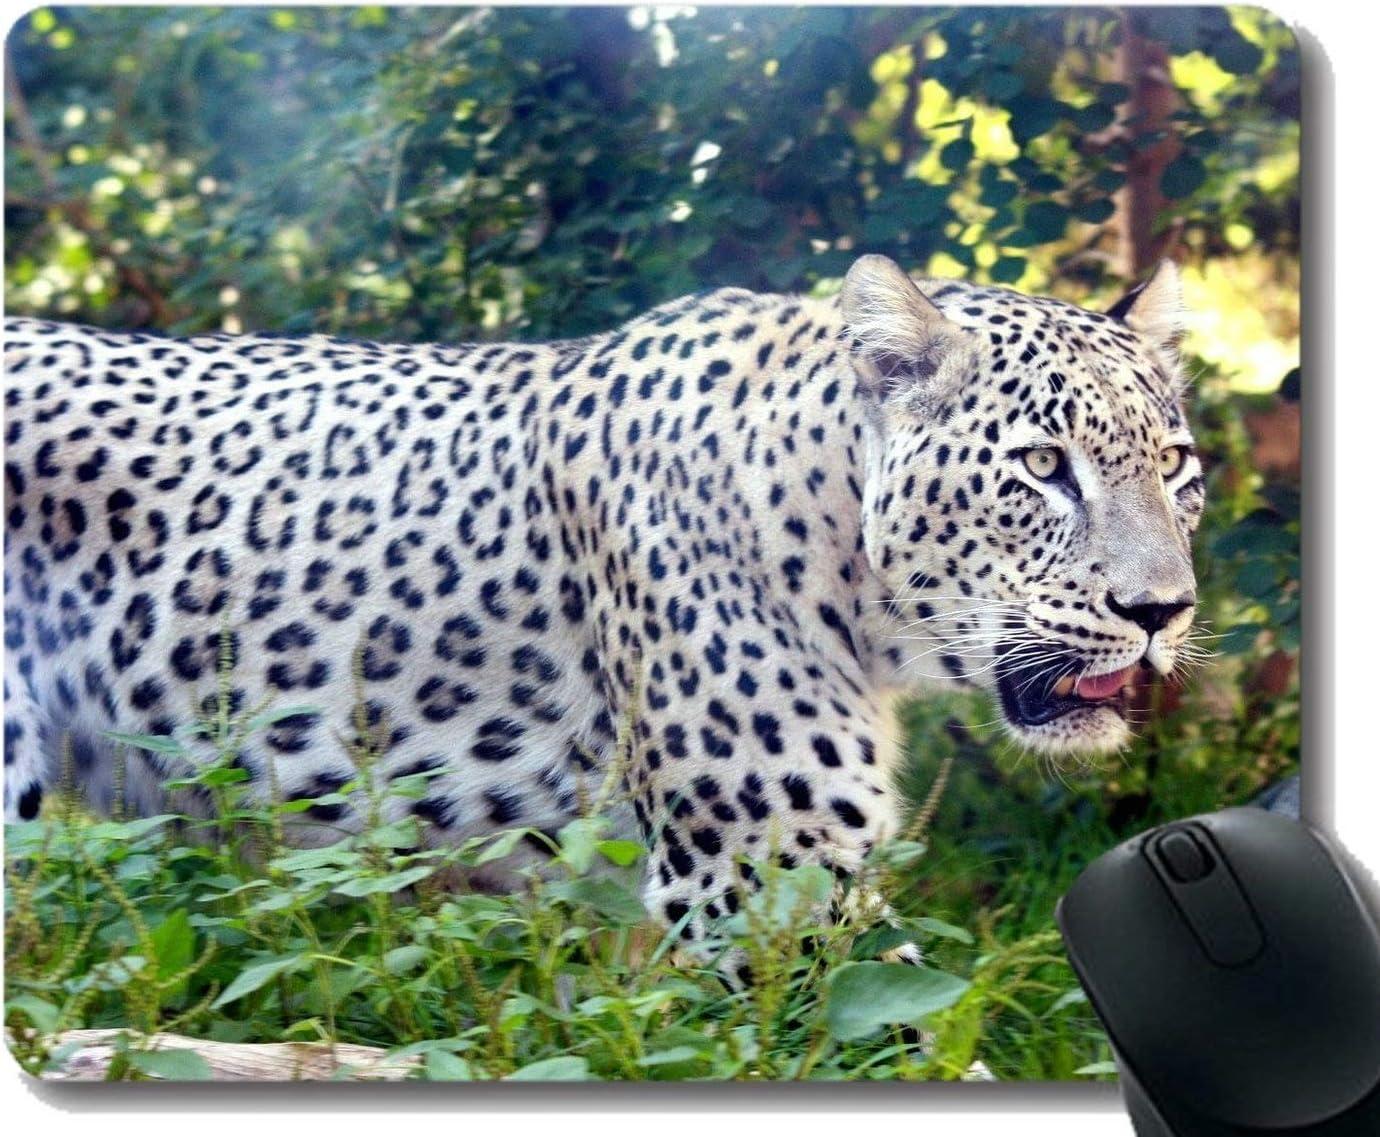 Yanteng Rectangle Mouse Pads para computadoras Laptop, Cat, Leopard, Tiger Mousepad Antideslizante de Goma